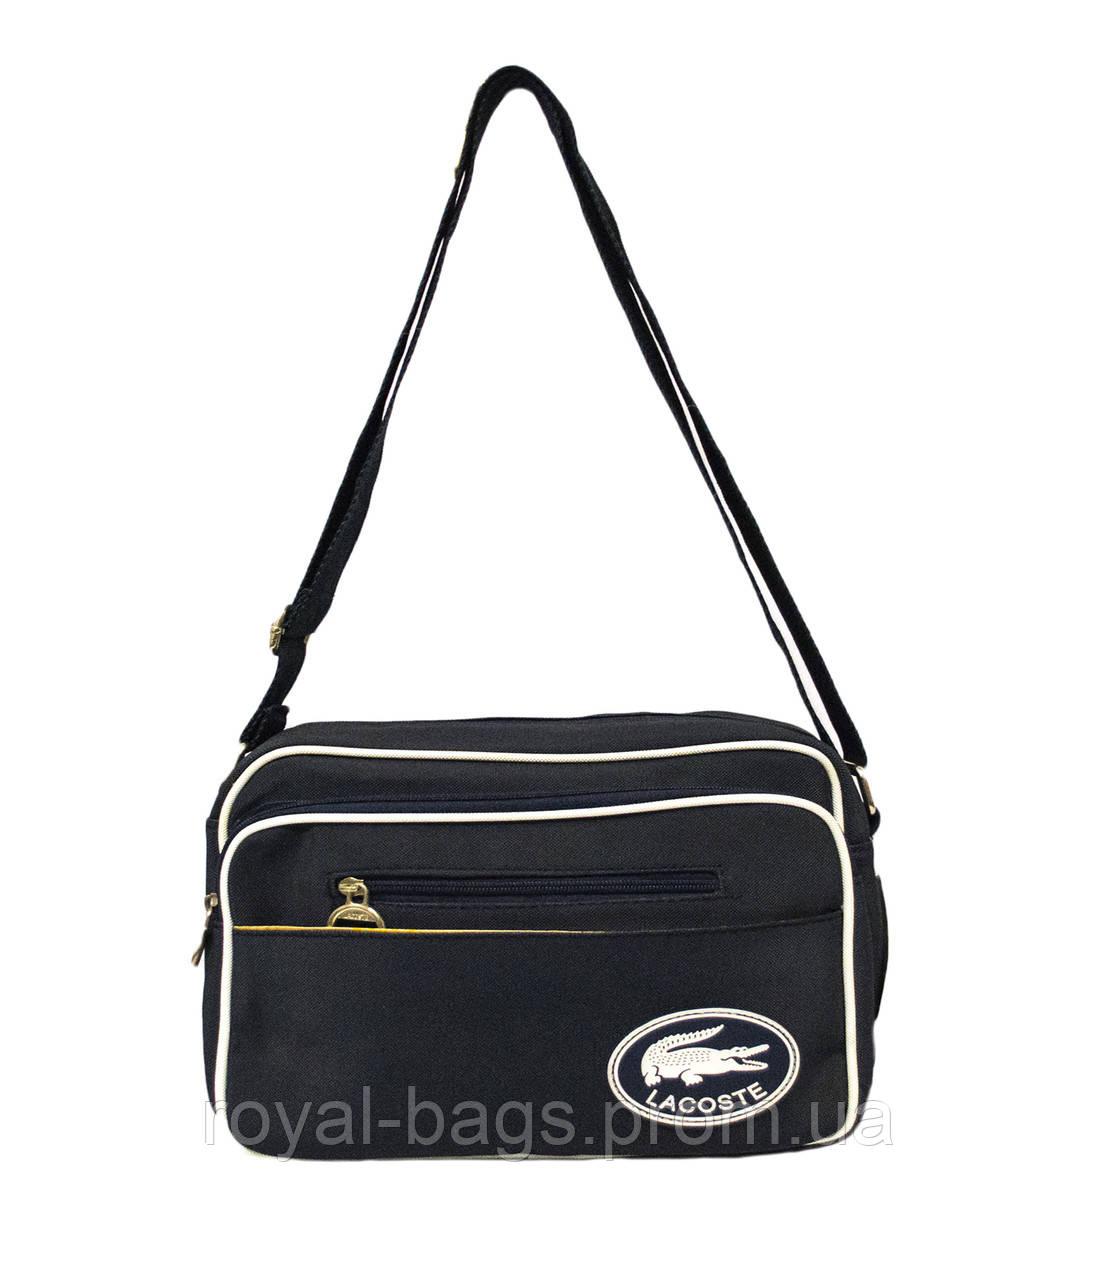 Молодежная сумка через плечо Lacoste 3 Цвета Синий